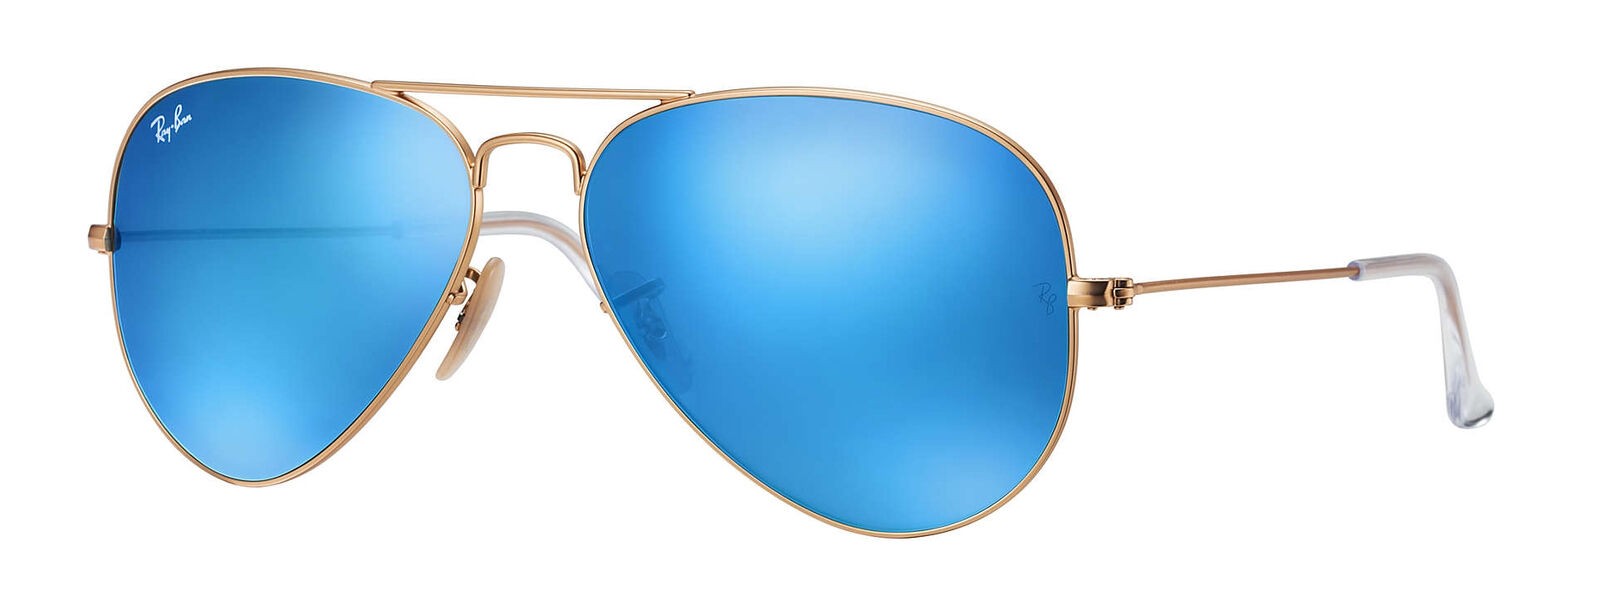 a9e2f33cd9a350 Ray-Ban RB3025 Aviator Flash Lenses Mirror Blue Sunglasses   eBay